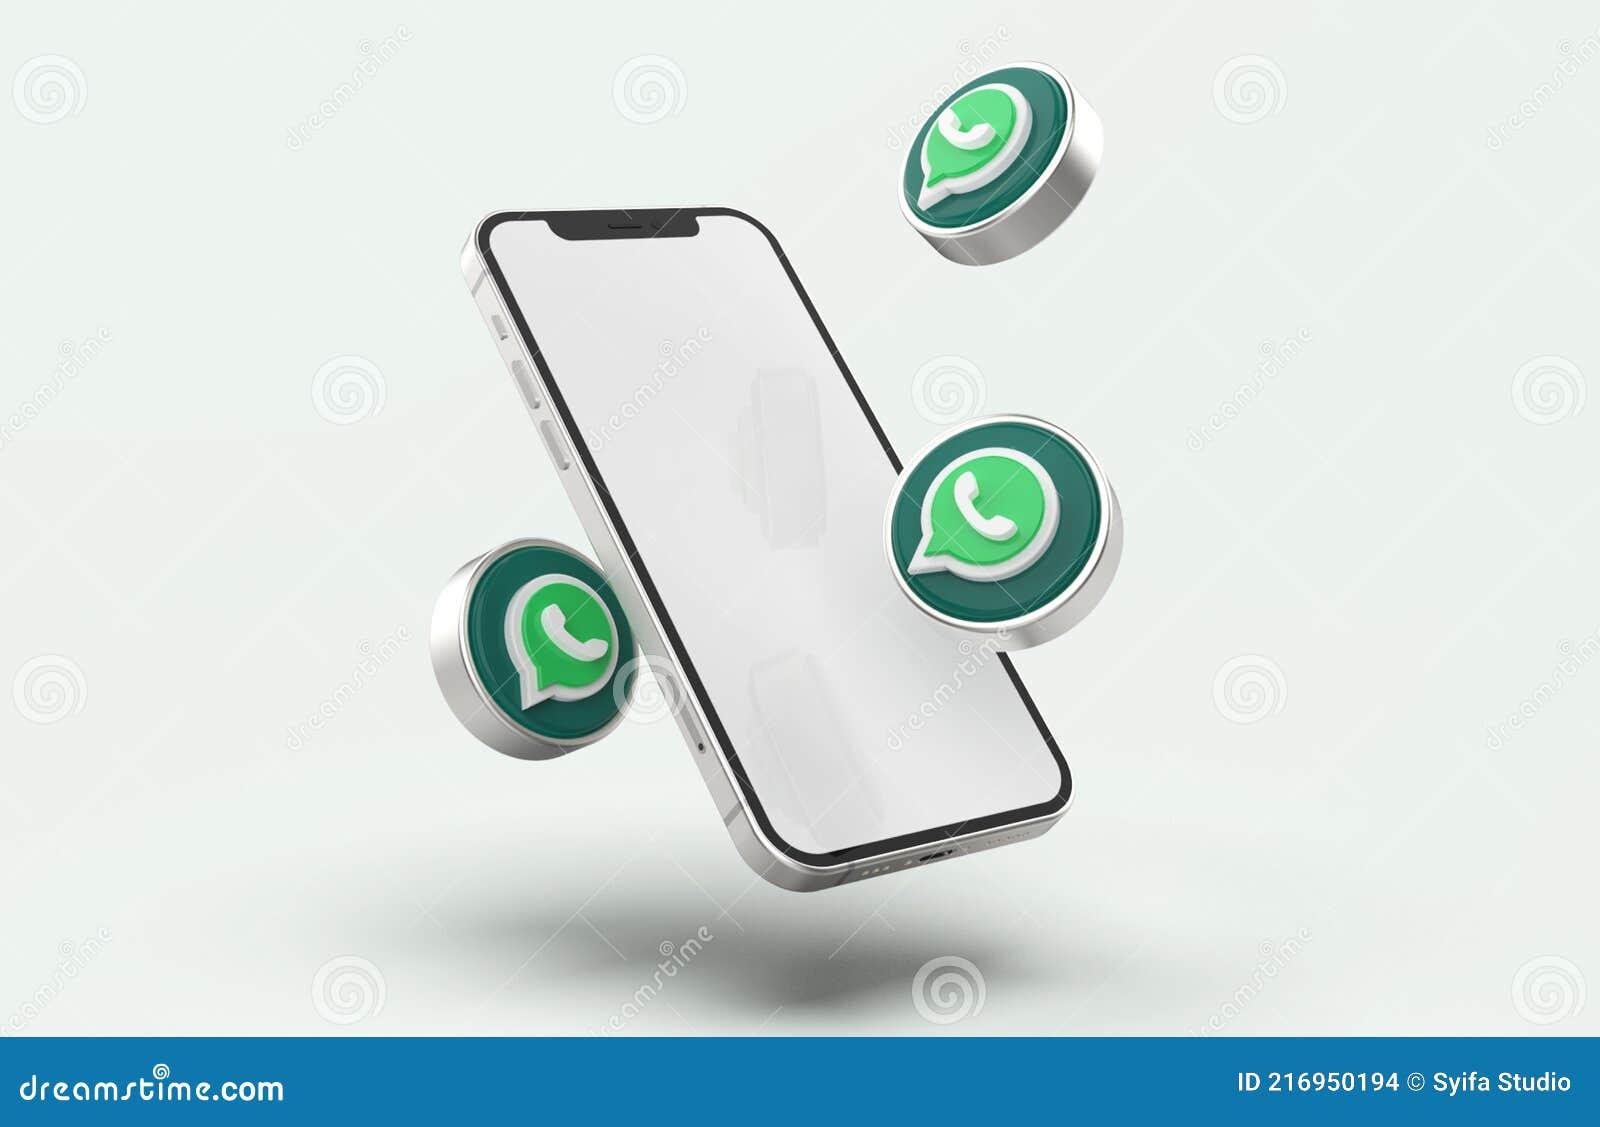 Whatsapp Mockup Stock Illustrations 182 Whatsapp Mockup Stock Illustrations Vectors Clipart Dreamstime